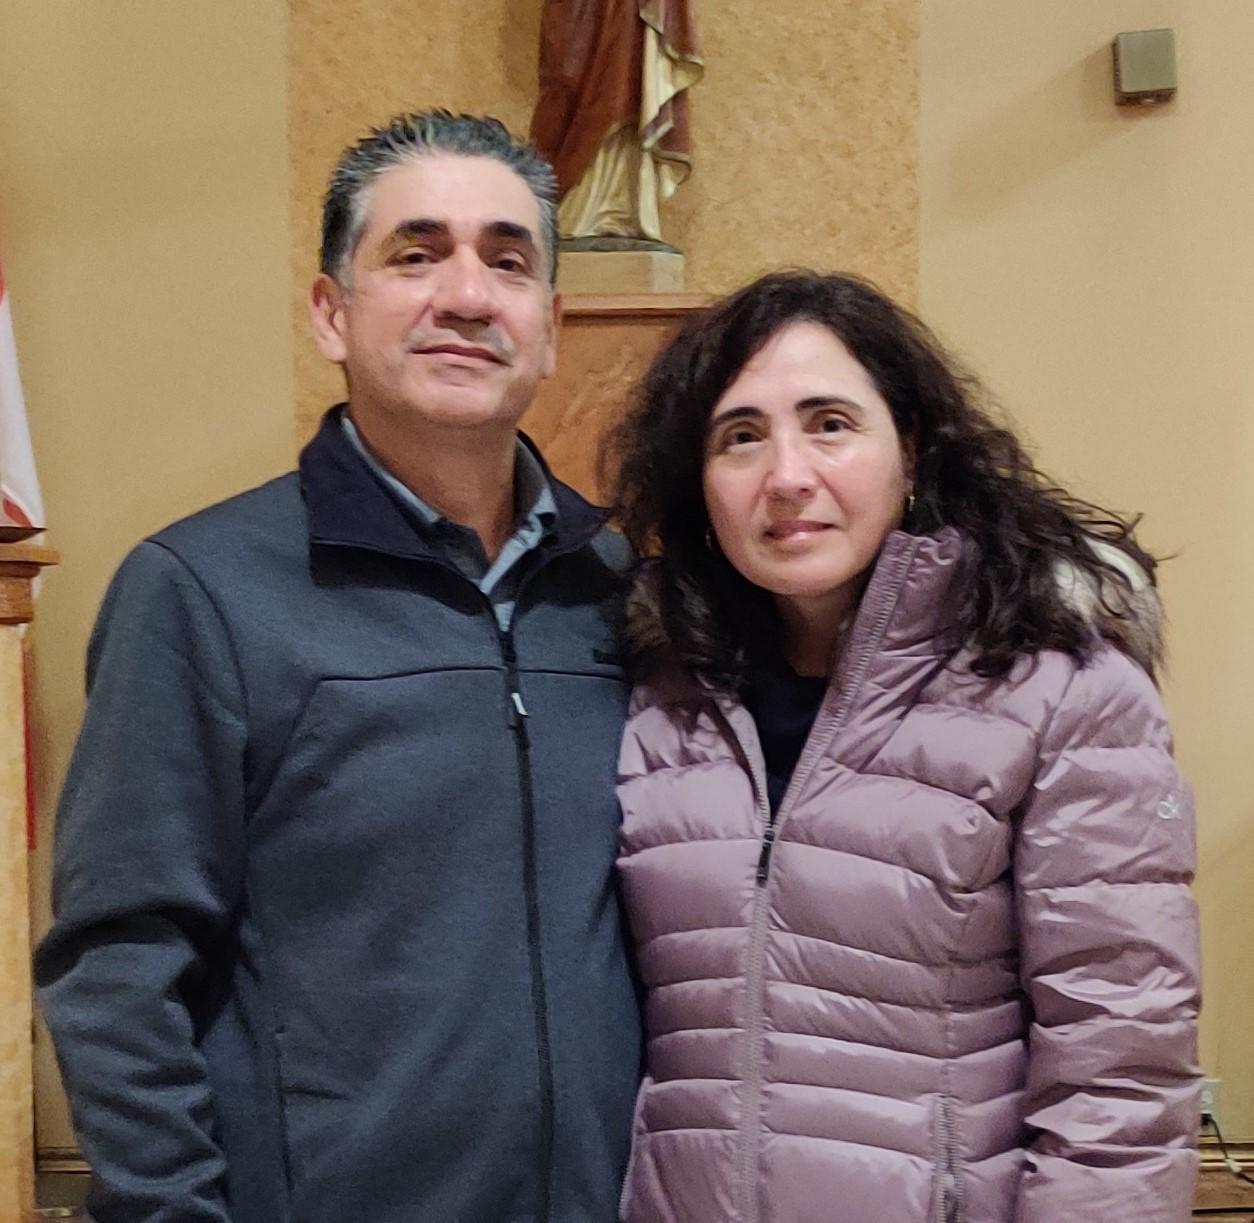 Alvaro and his wife Gaby